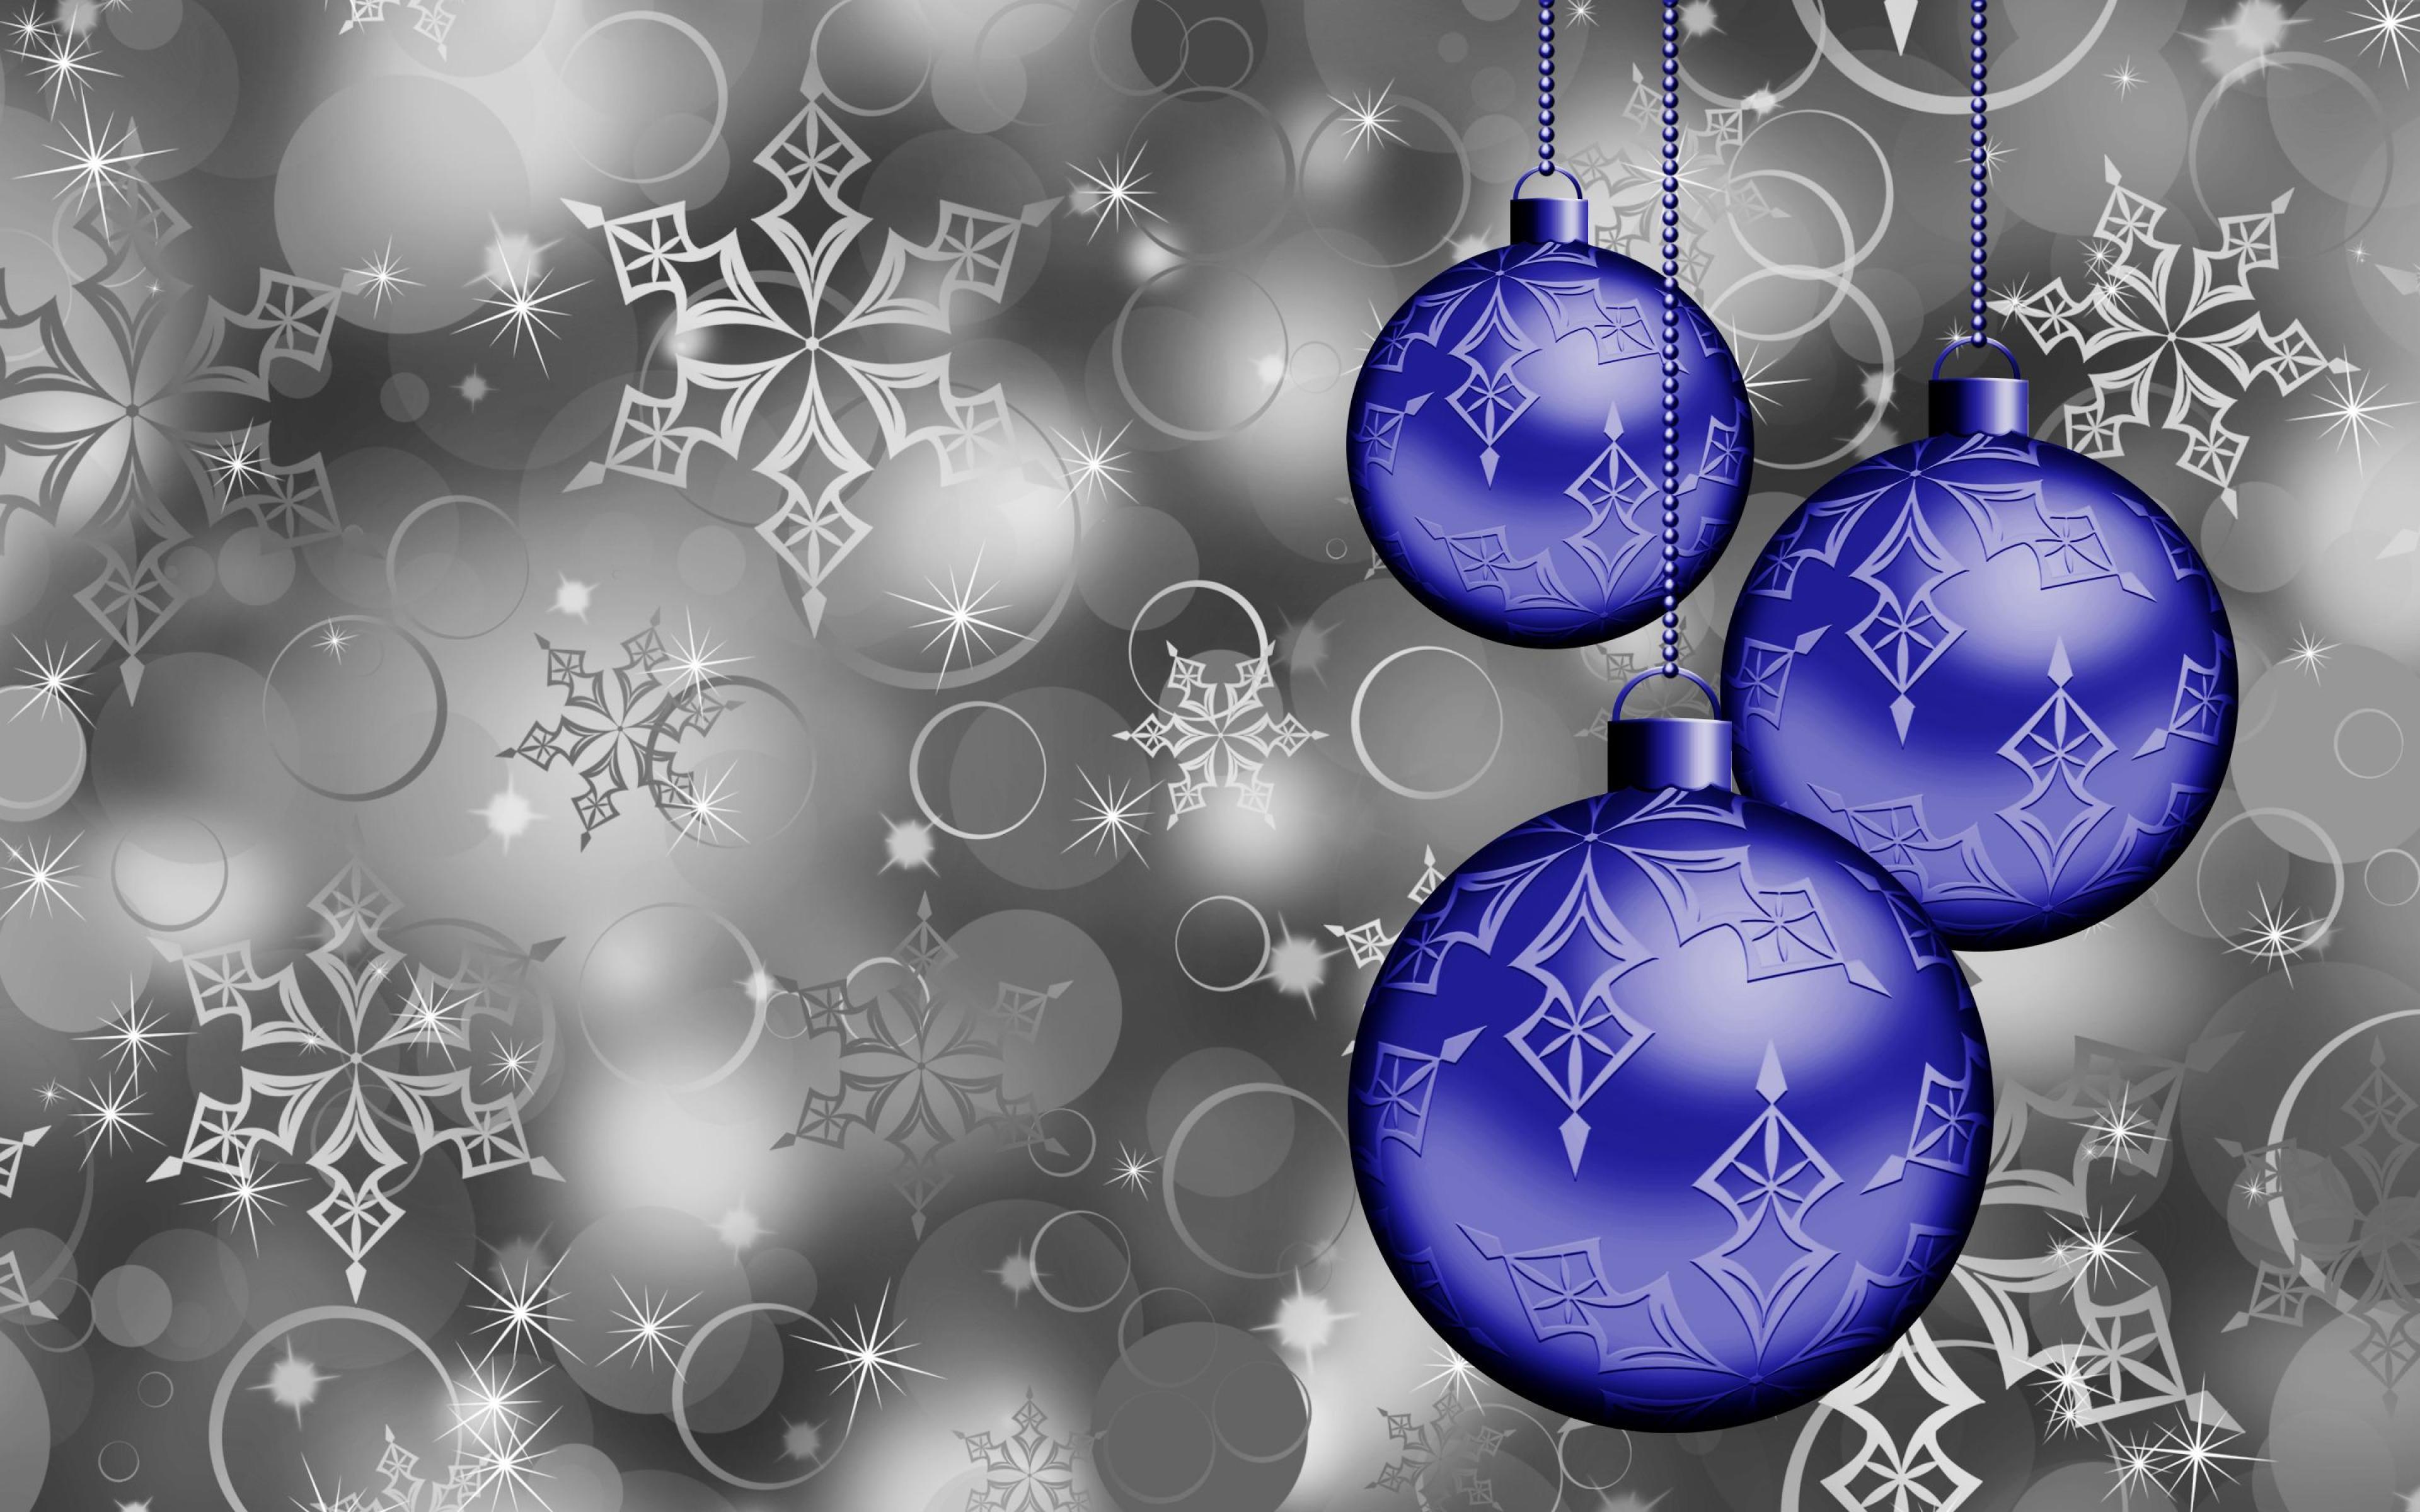 Christmas Ornament Wallpapers HD 3840x2400